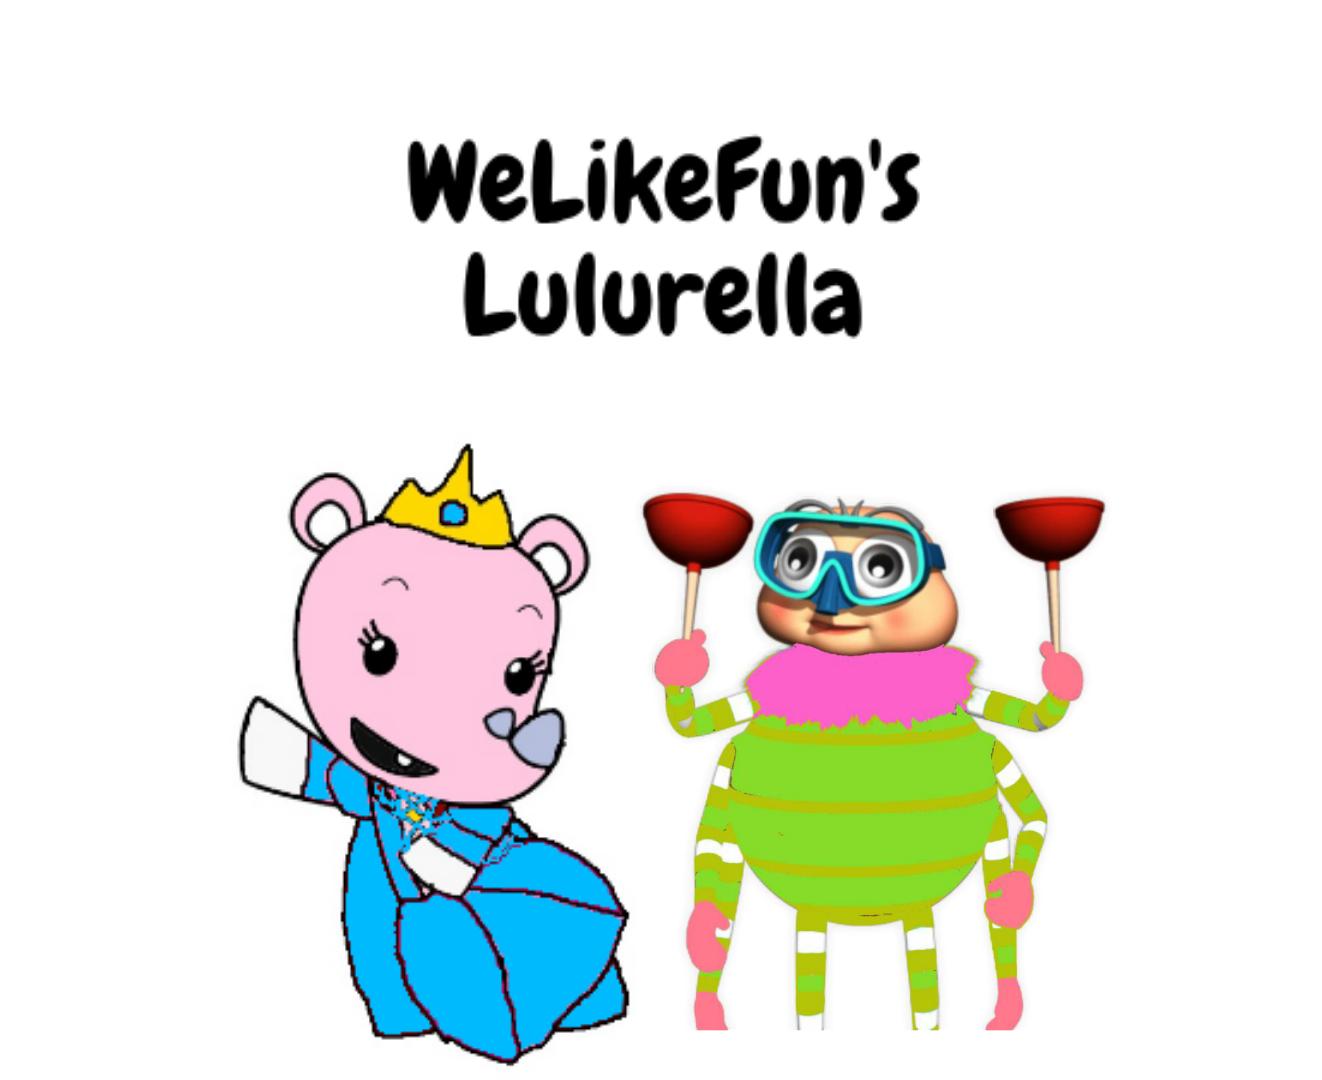 Lulurella